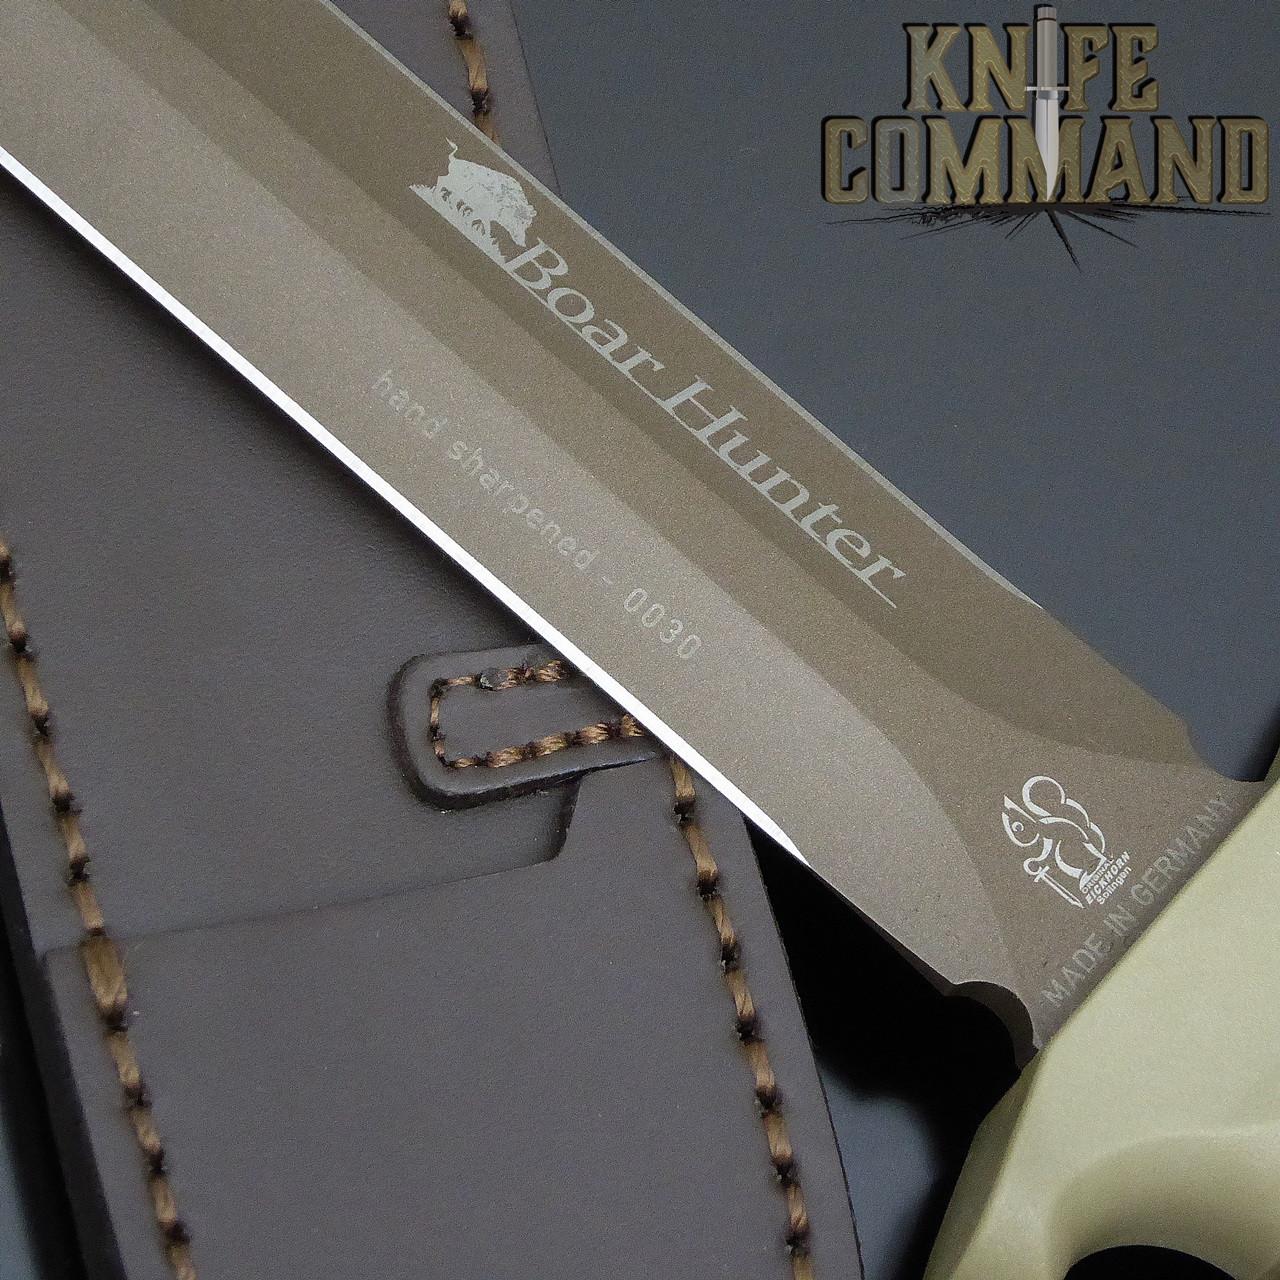 Coated, hand sharpened blade.